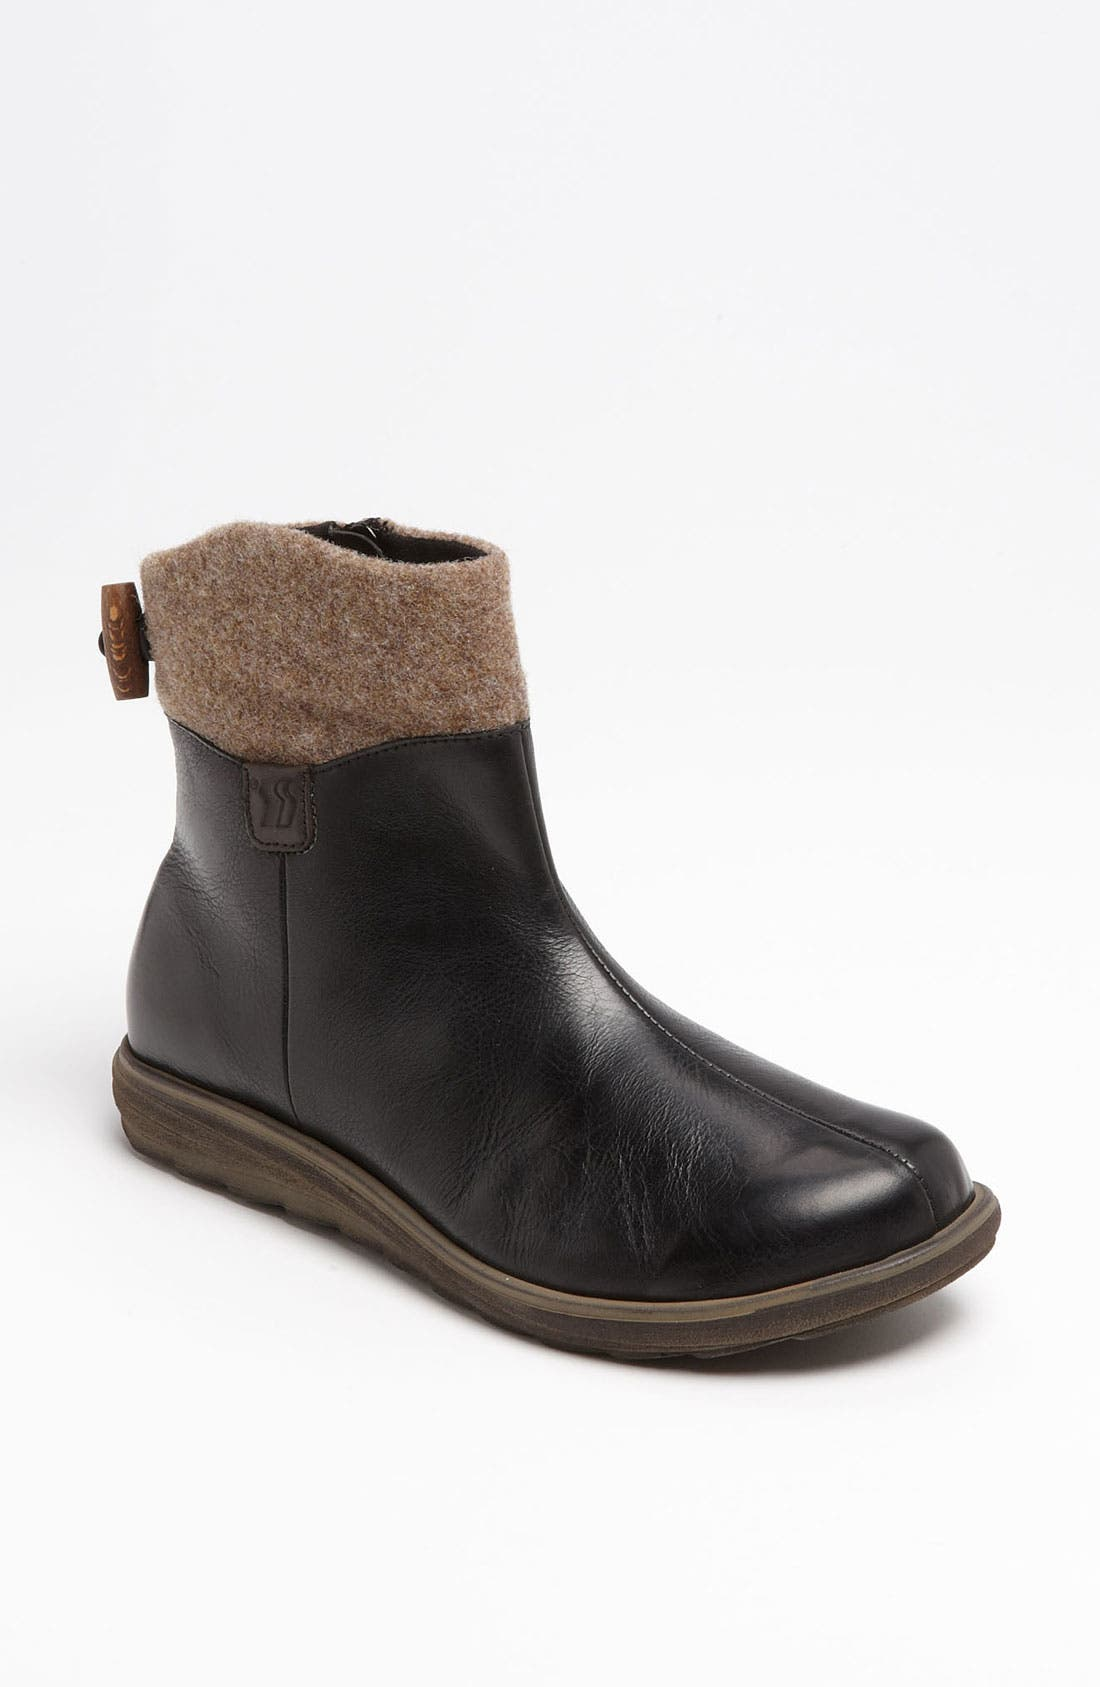 Alternate Image 1 Selected - Romika® 'Sonja 05' Boot